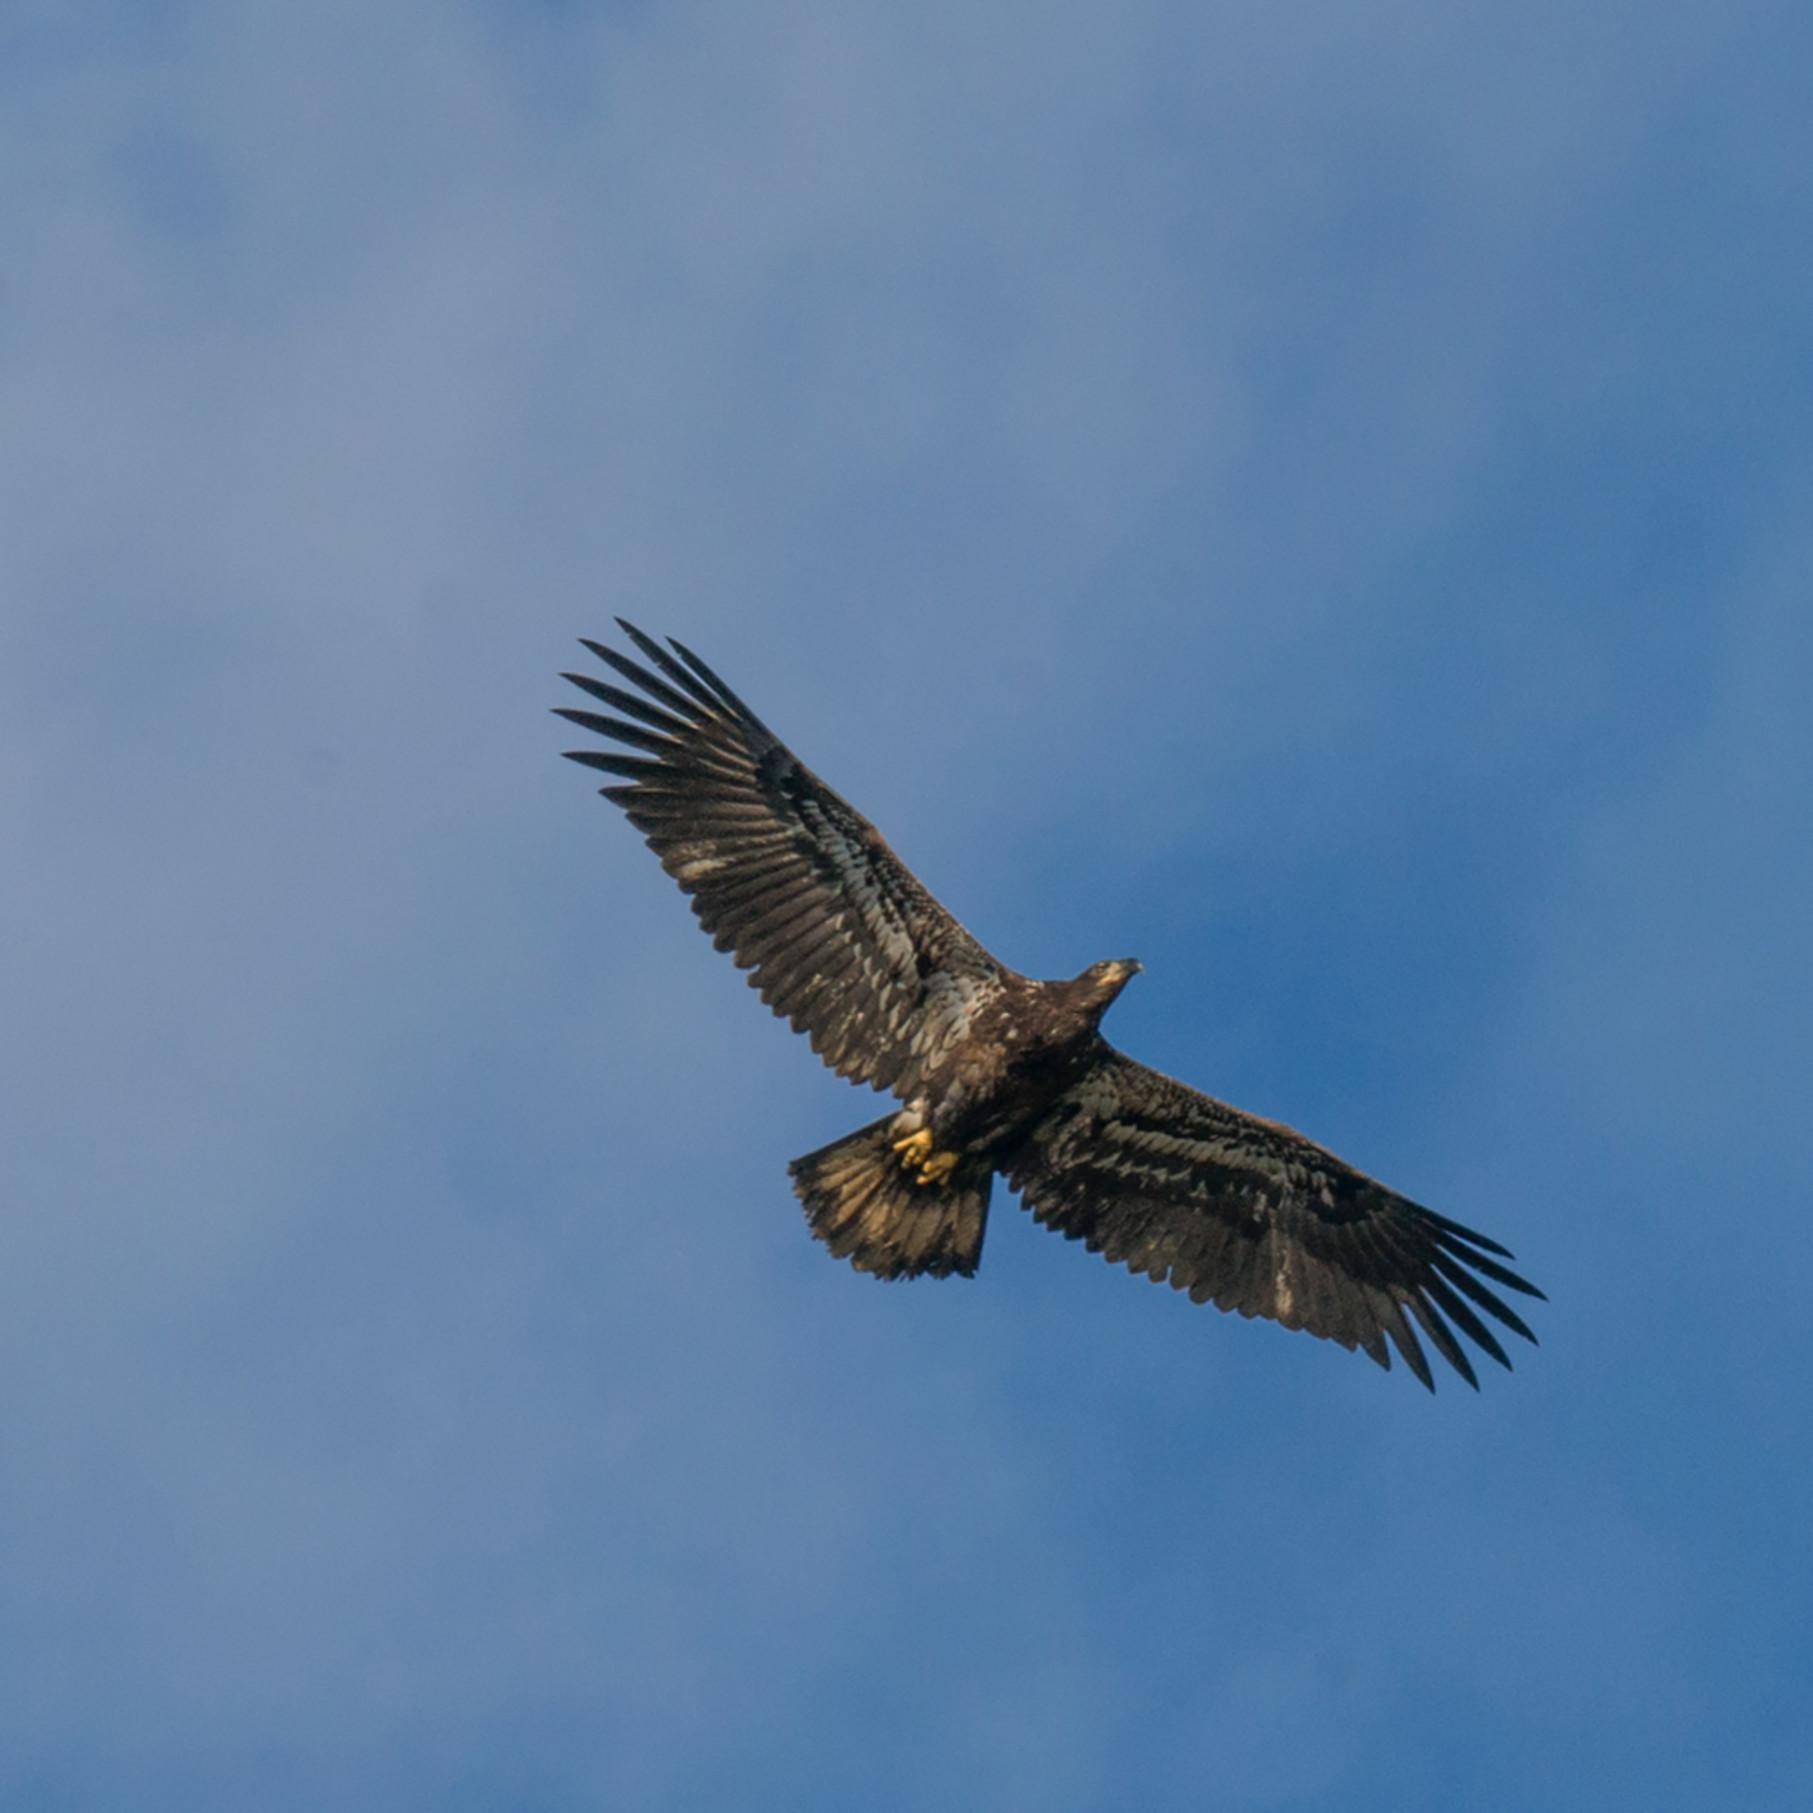 Juvenile eagle ccr9zr